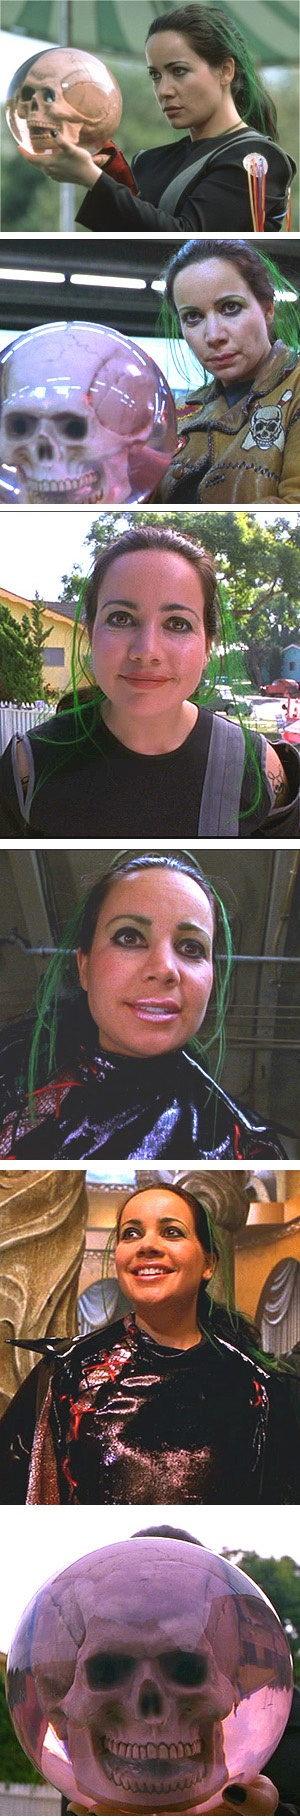 Janeane Garofalo as Bowler in Mystery Men (1999).